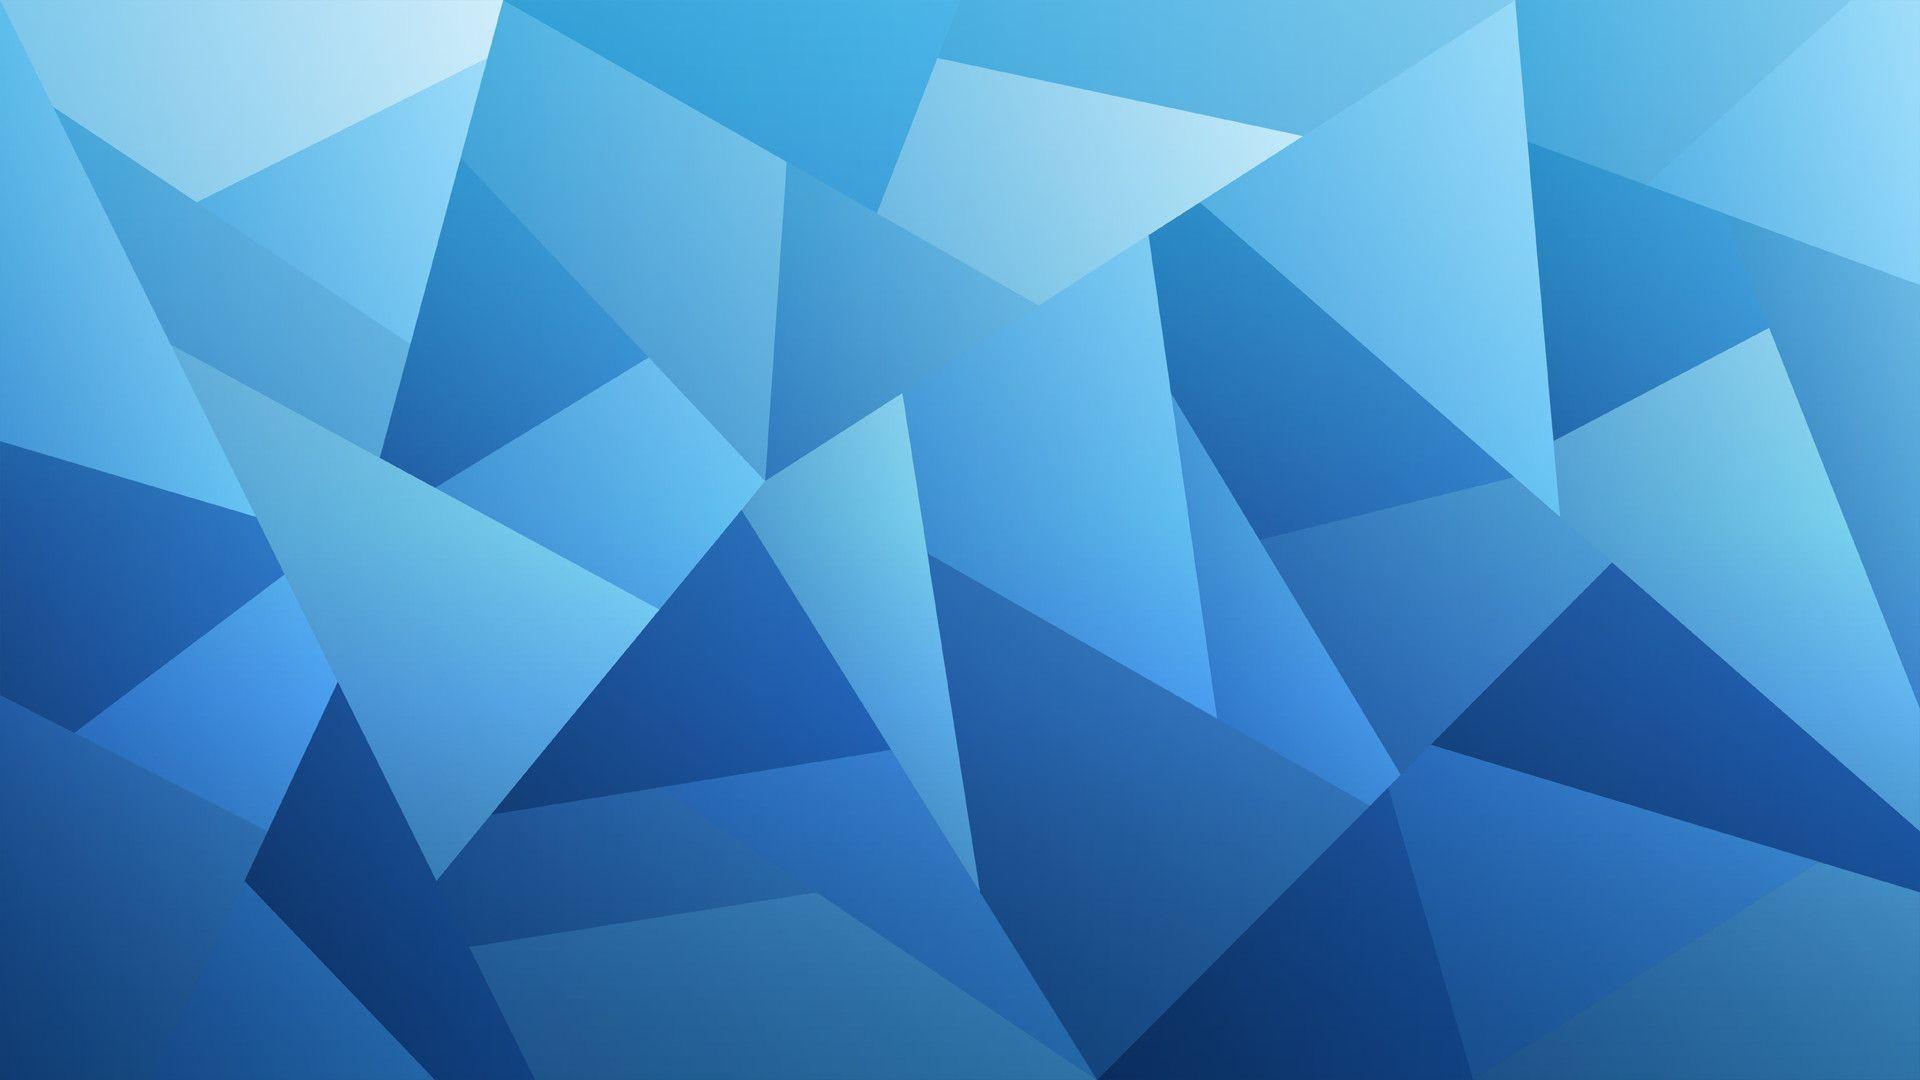 Geometric Laptop Wallpapers - Wallpaper Cave